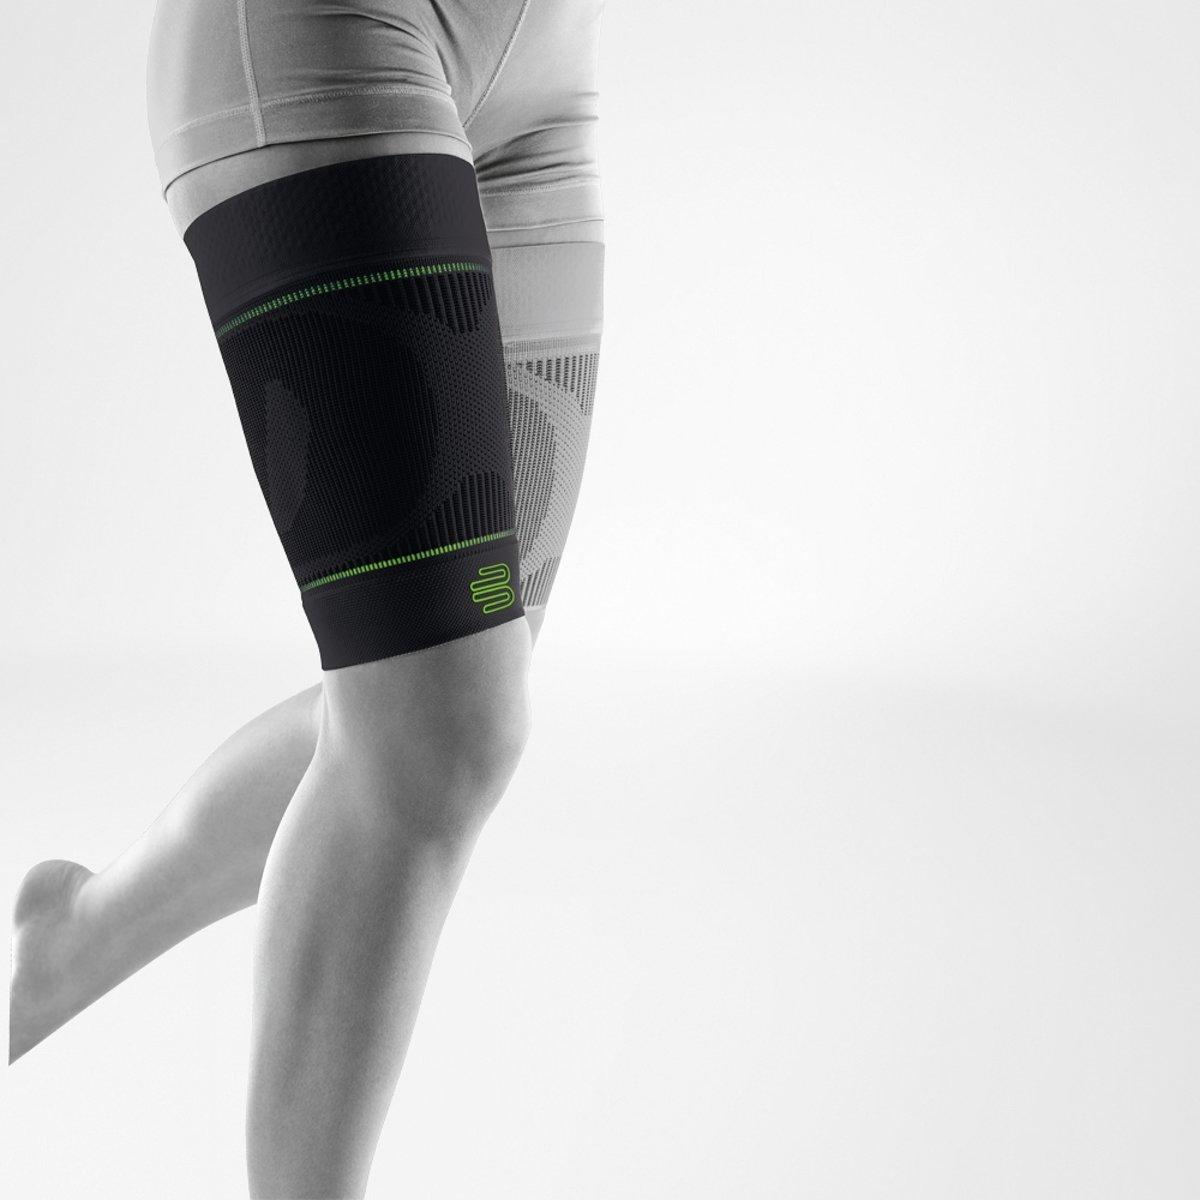 Bauerfeind Sport Compressie Bovenbeen Hamstring Sleeve (Per paar) - Zwart